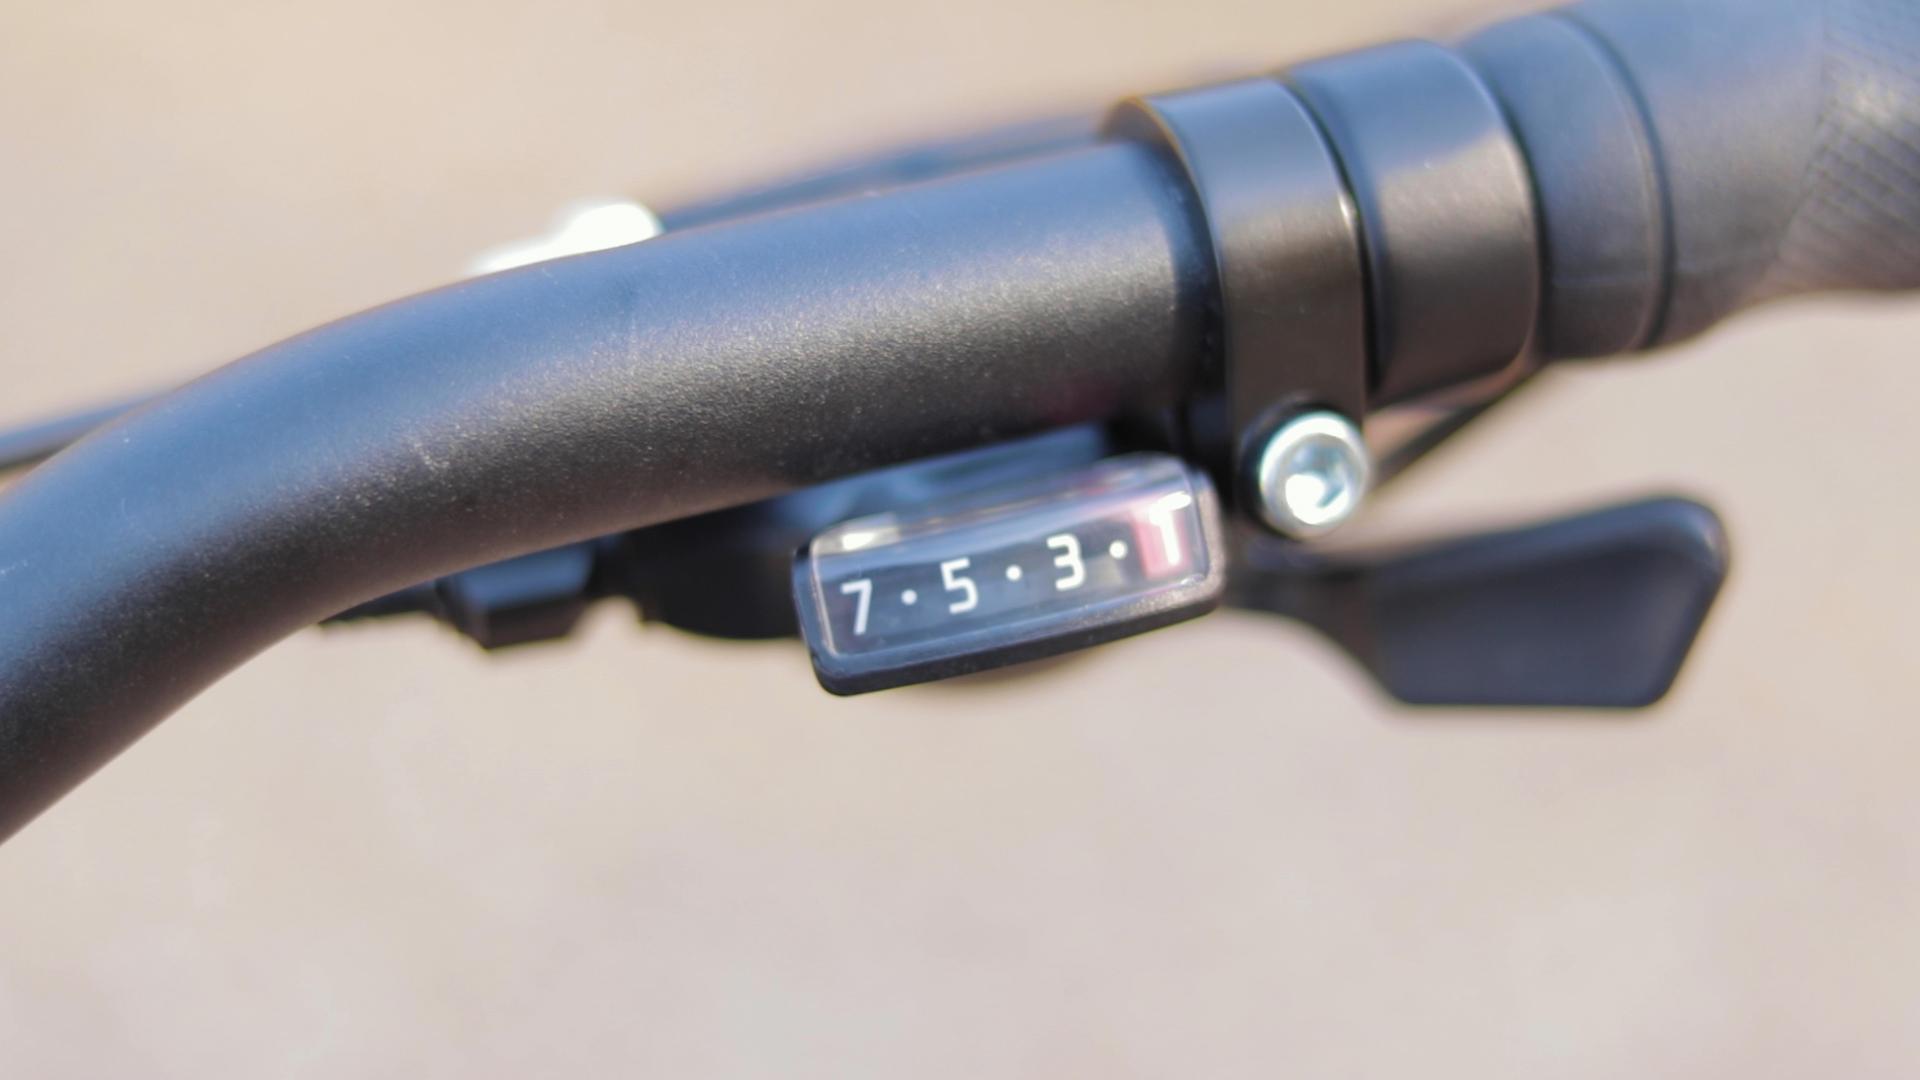 electrified-reviews-izip-e3-brio-electric-bike-review-shimano-acera-trigger-shifter.jpg